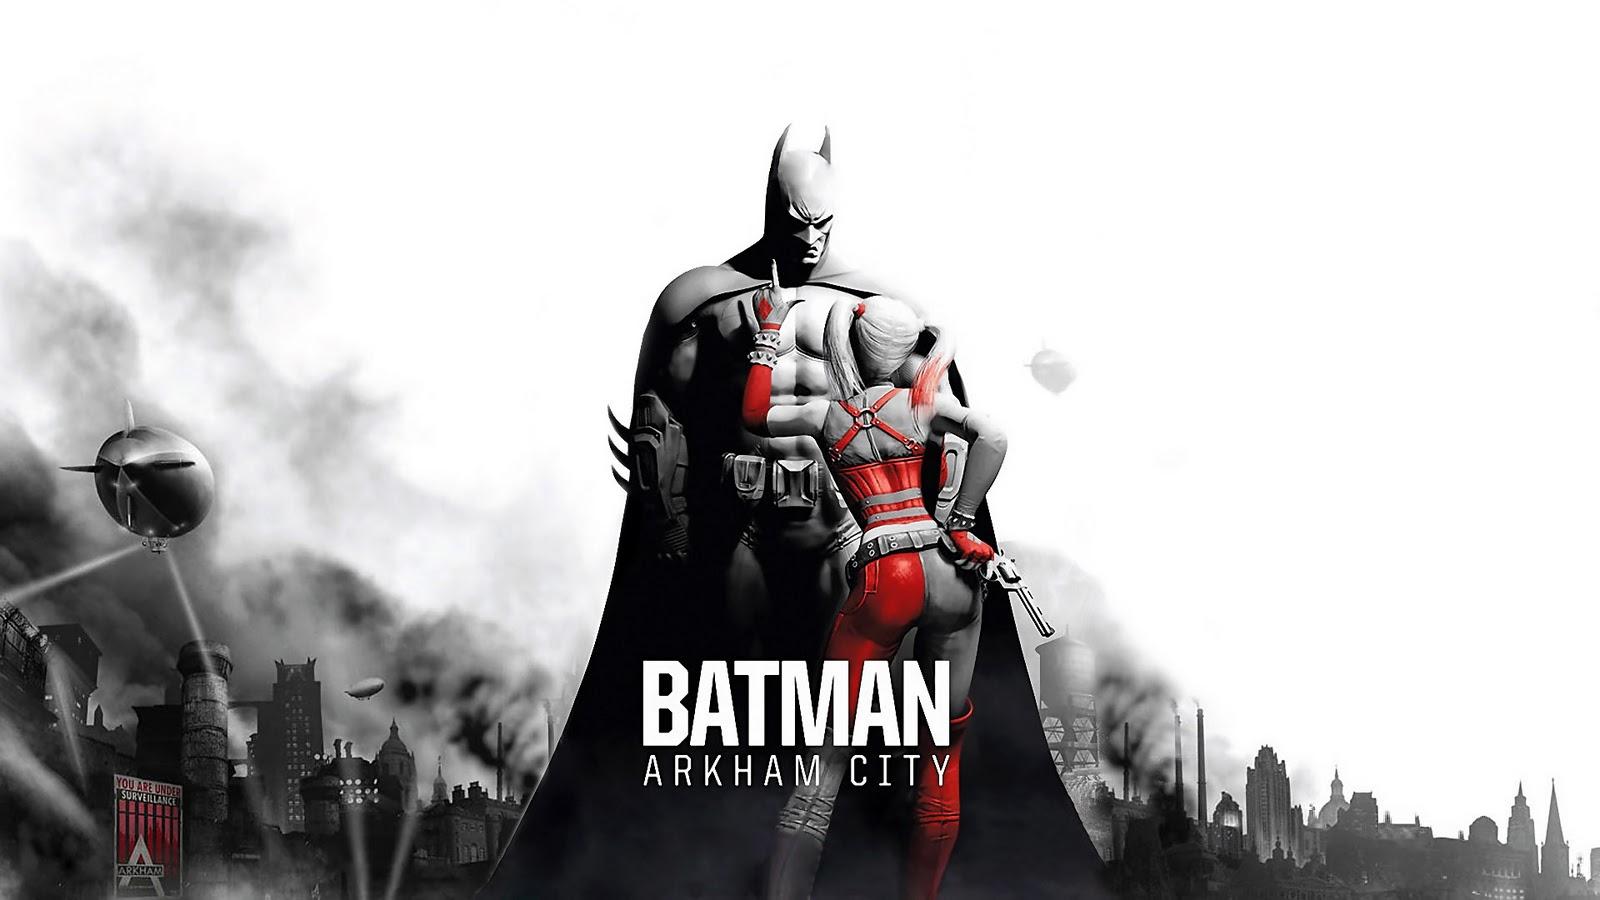 De Gamer pra Gamer: Batman: Arkham City trailer e análise